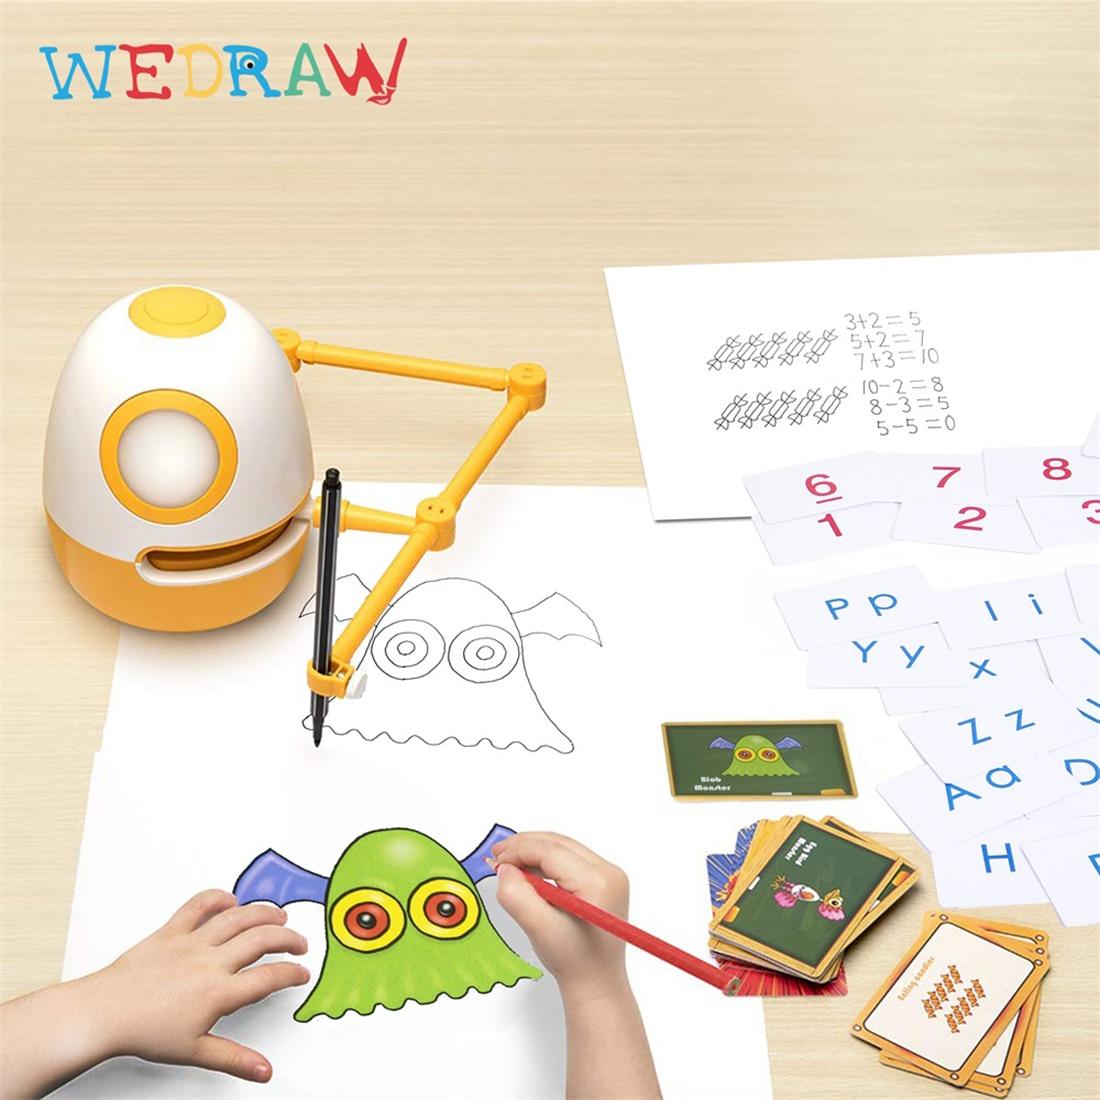 wedraw eggy criancas desenho robo genio kit 04